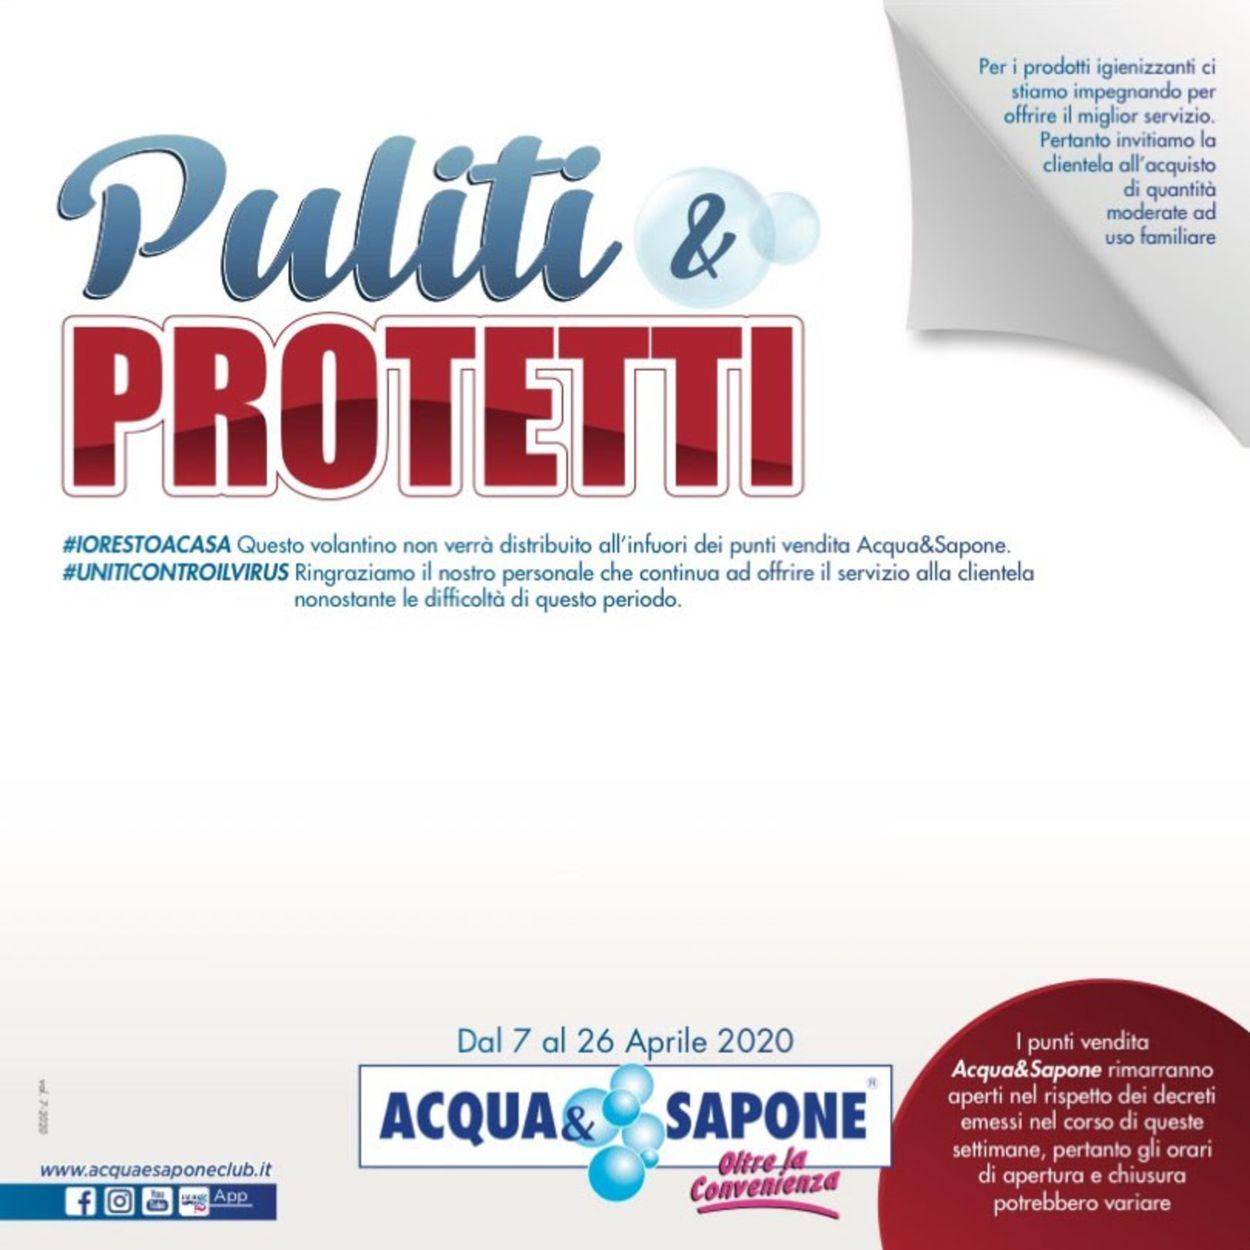 Volantino Acqua & Sapone - Offerte 07/04-26/04/2020